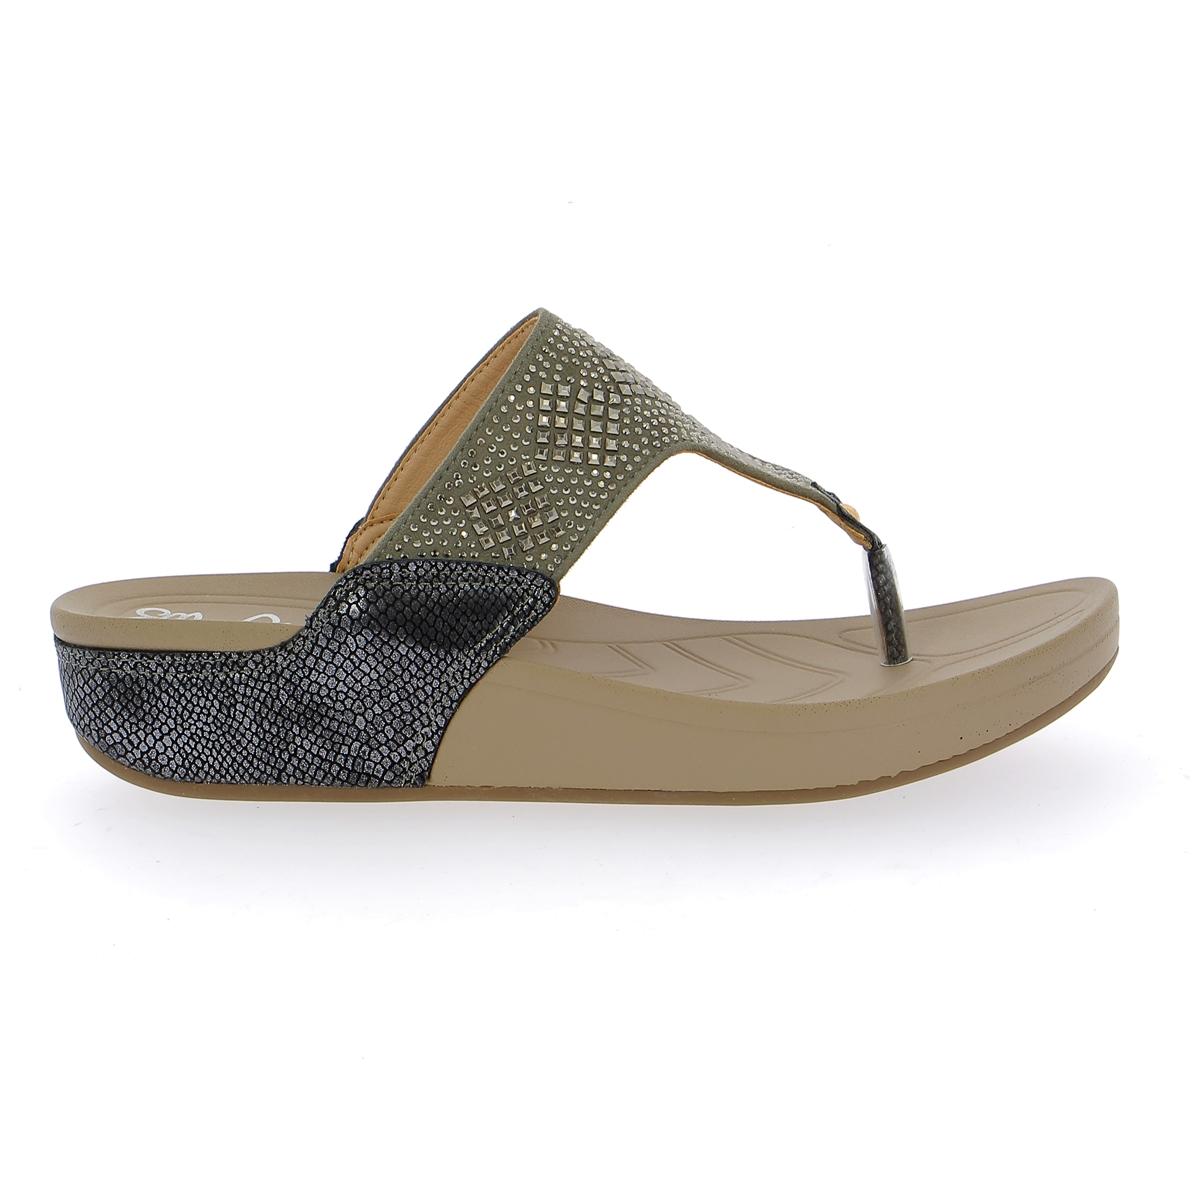 Cypres Muiltjes - slippers metaal